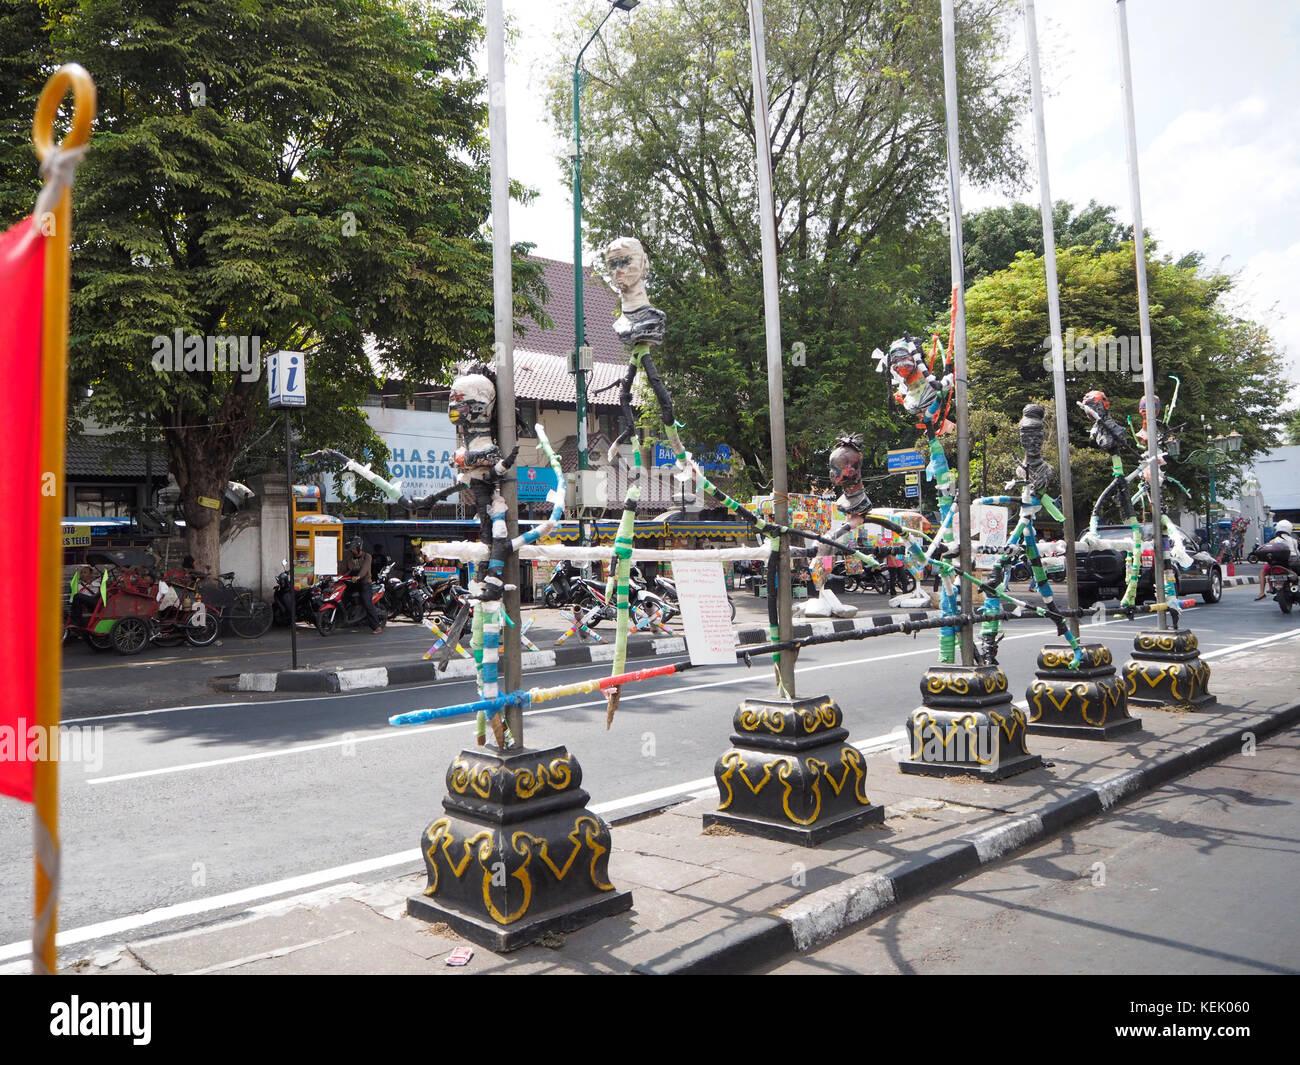 Street art on road divider at  Malioboro Road in Jogjakarta, Central Java, Indonesia. - Stock Image